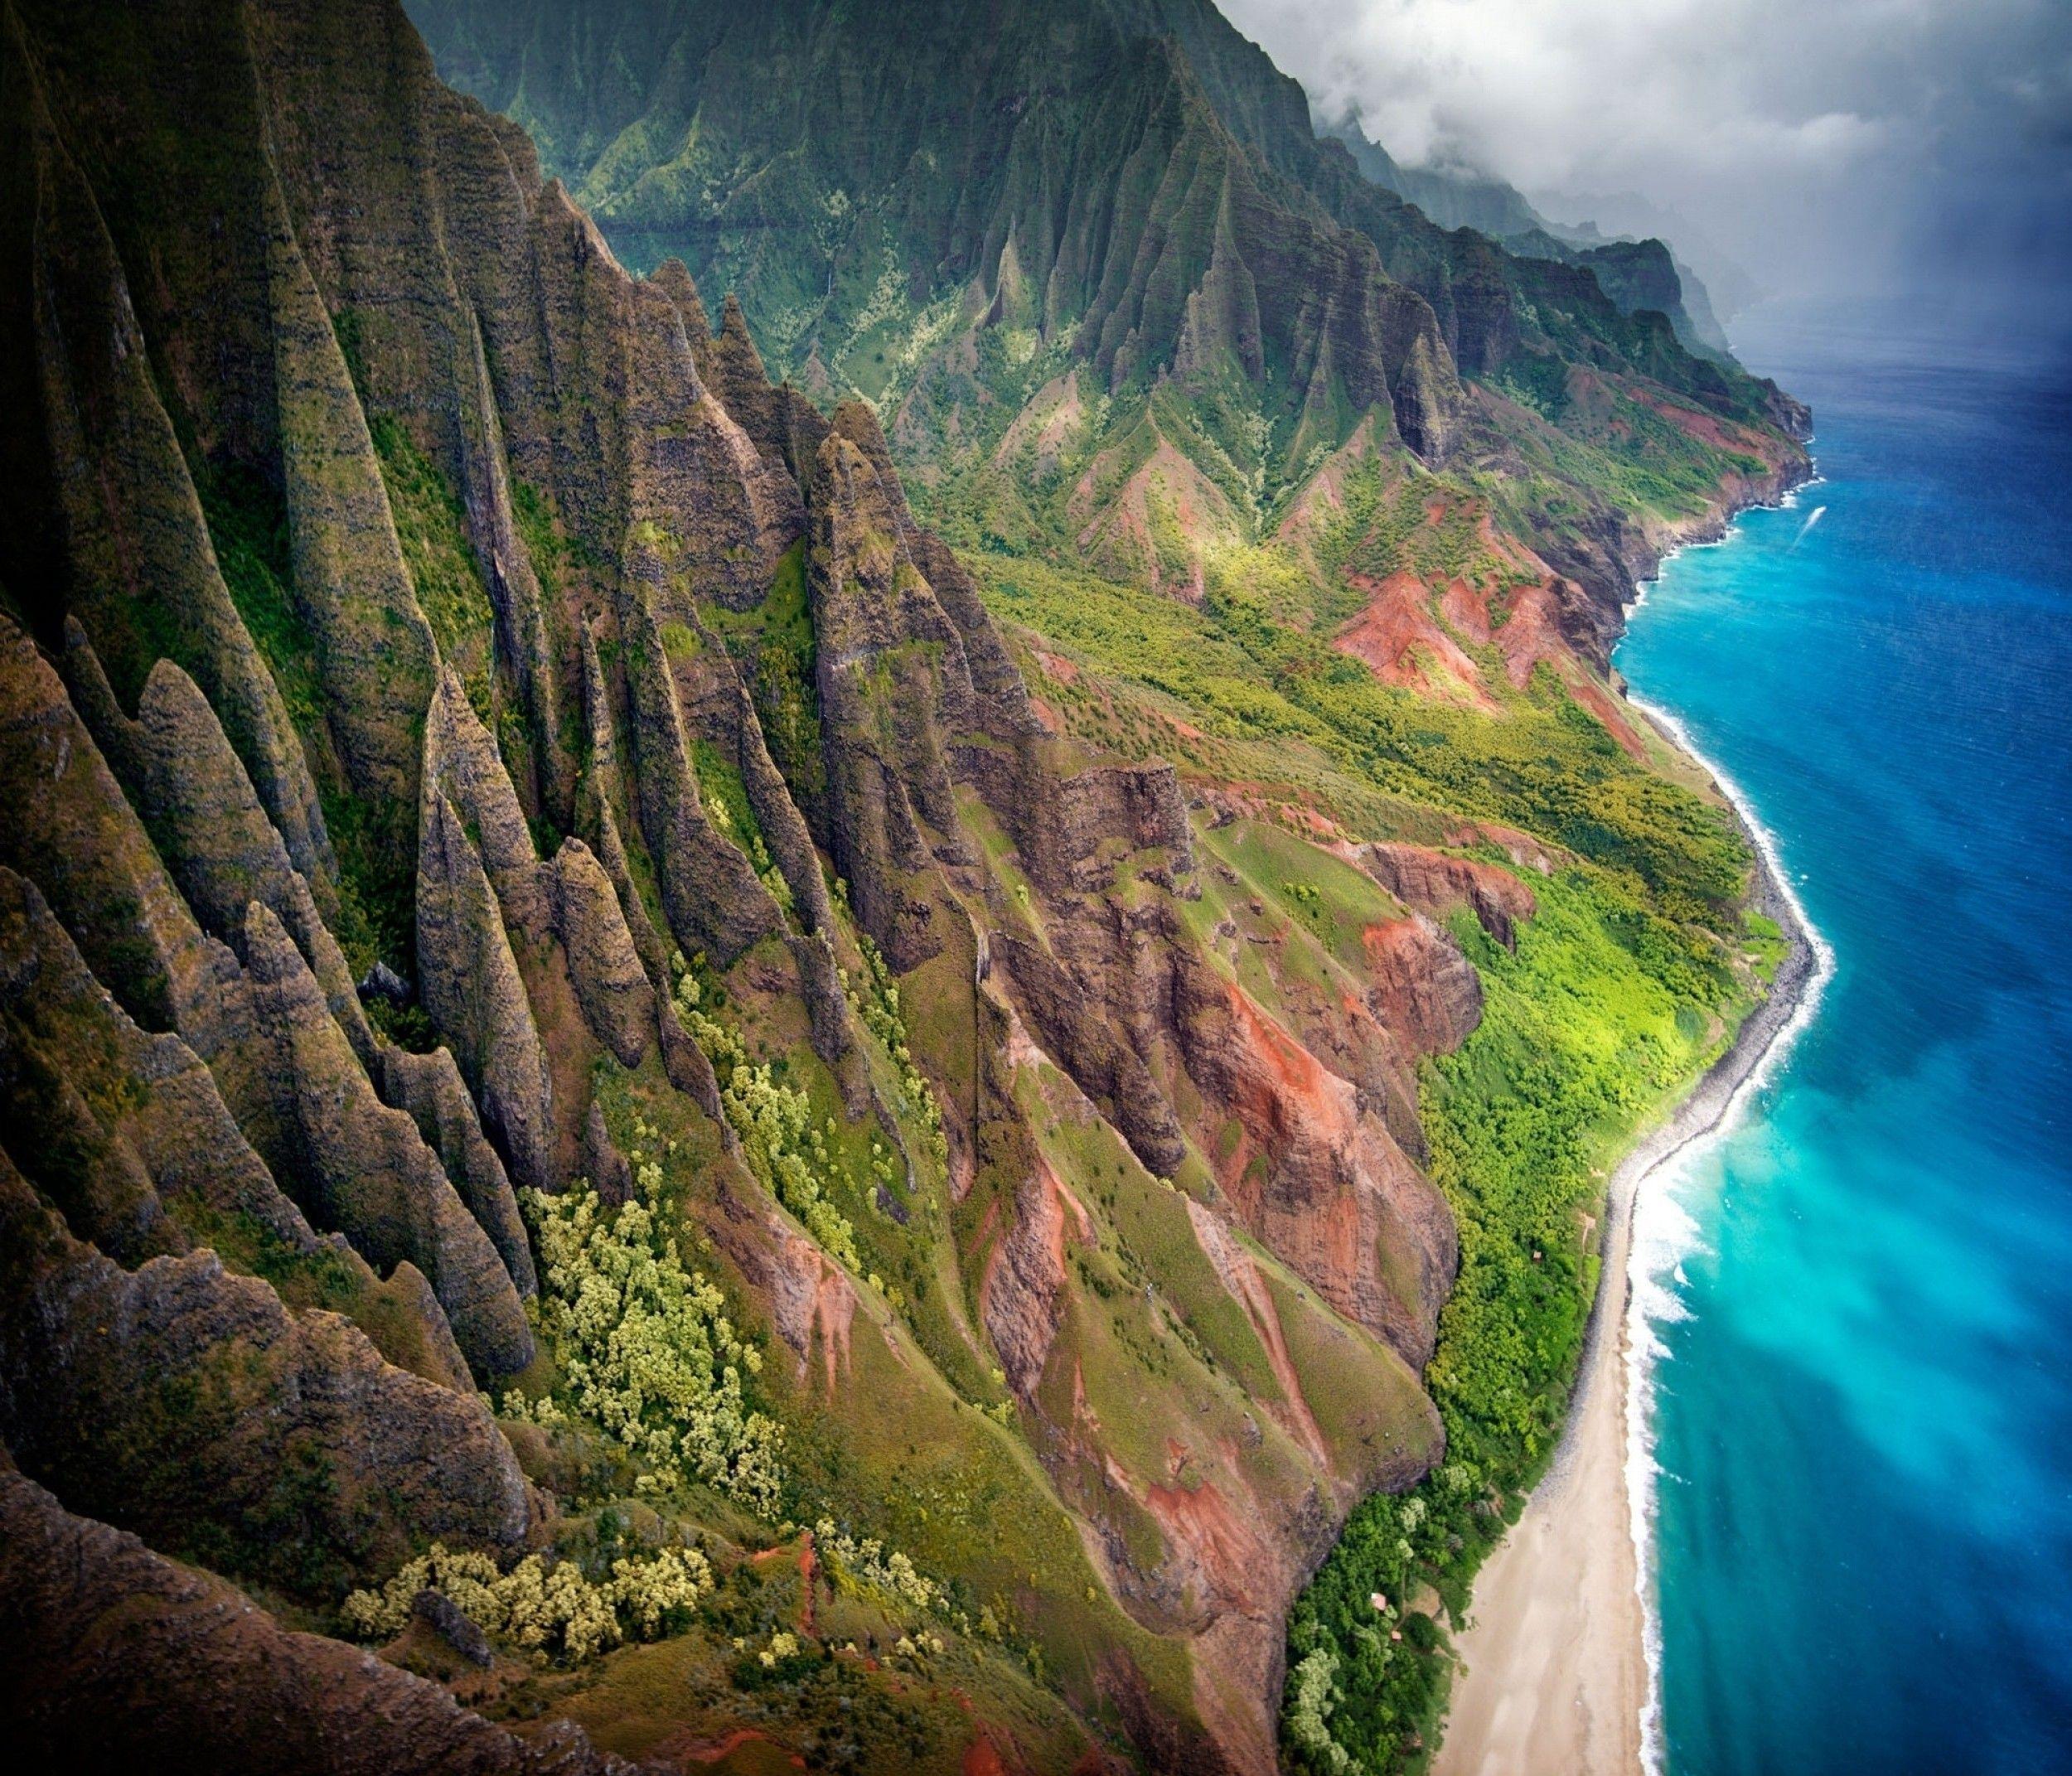 Kauai iPhone Wallpapers   Top Kauai iPhone Backgrounds 2500x2143